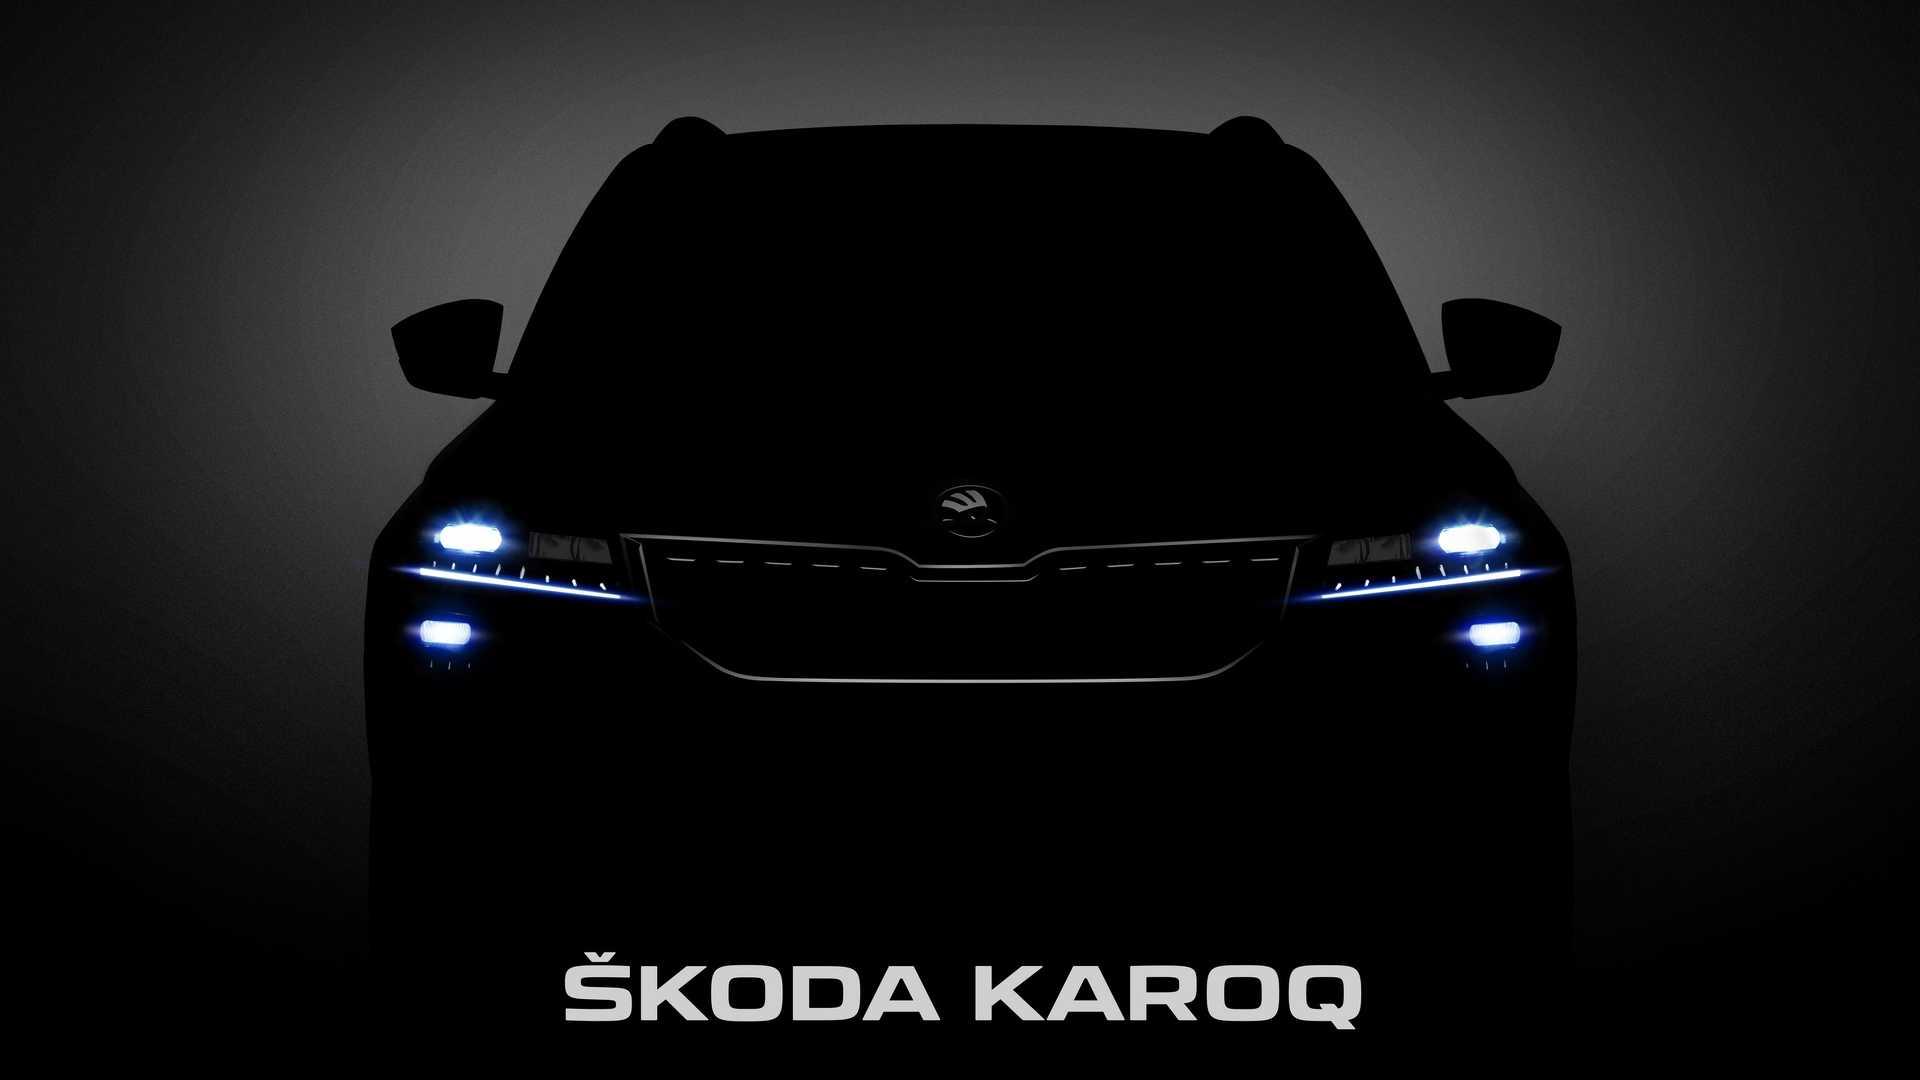 2018 Skoda Karoq Says Hi In New Batch Of Teaser Photos Autoevolution